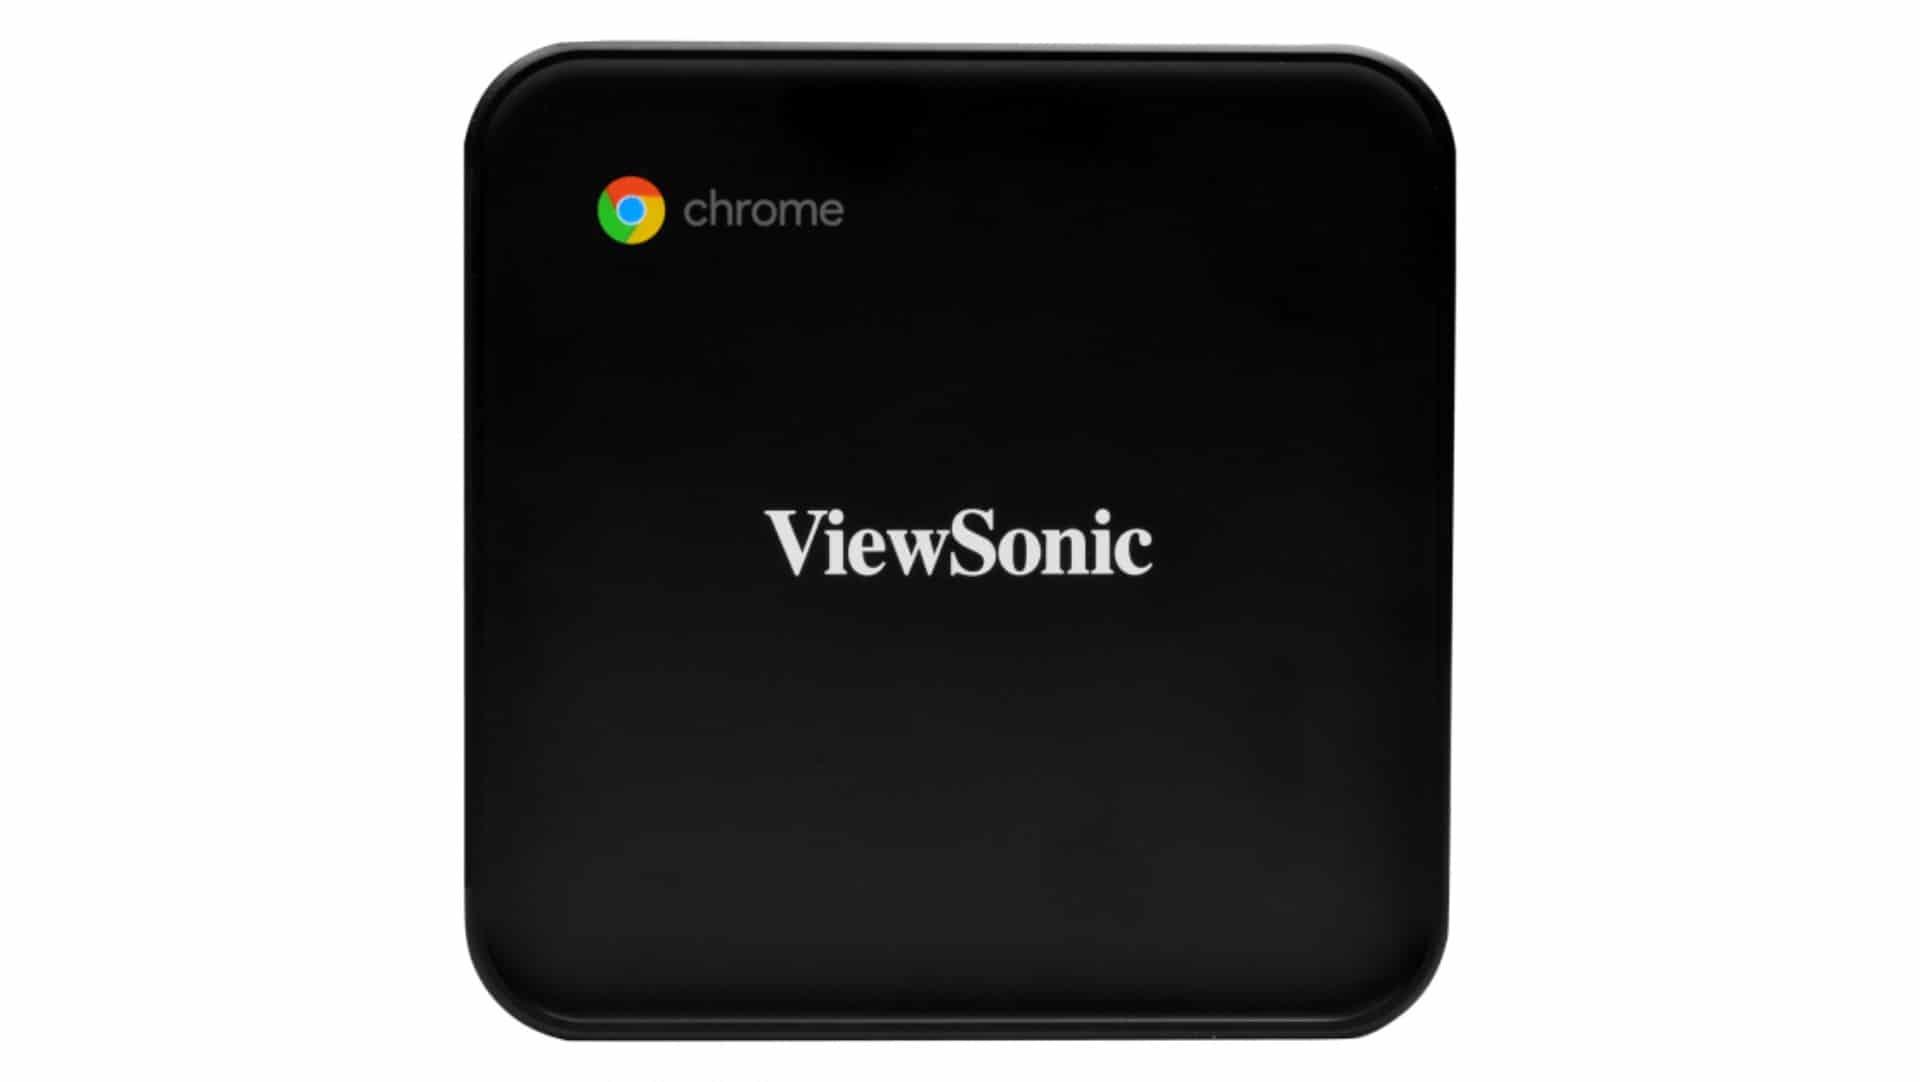 ViewSonic NMB660 Chromebox 3